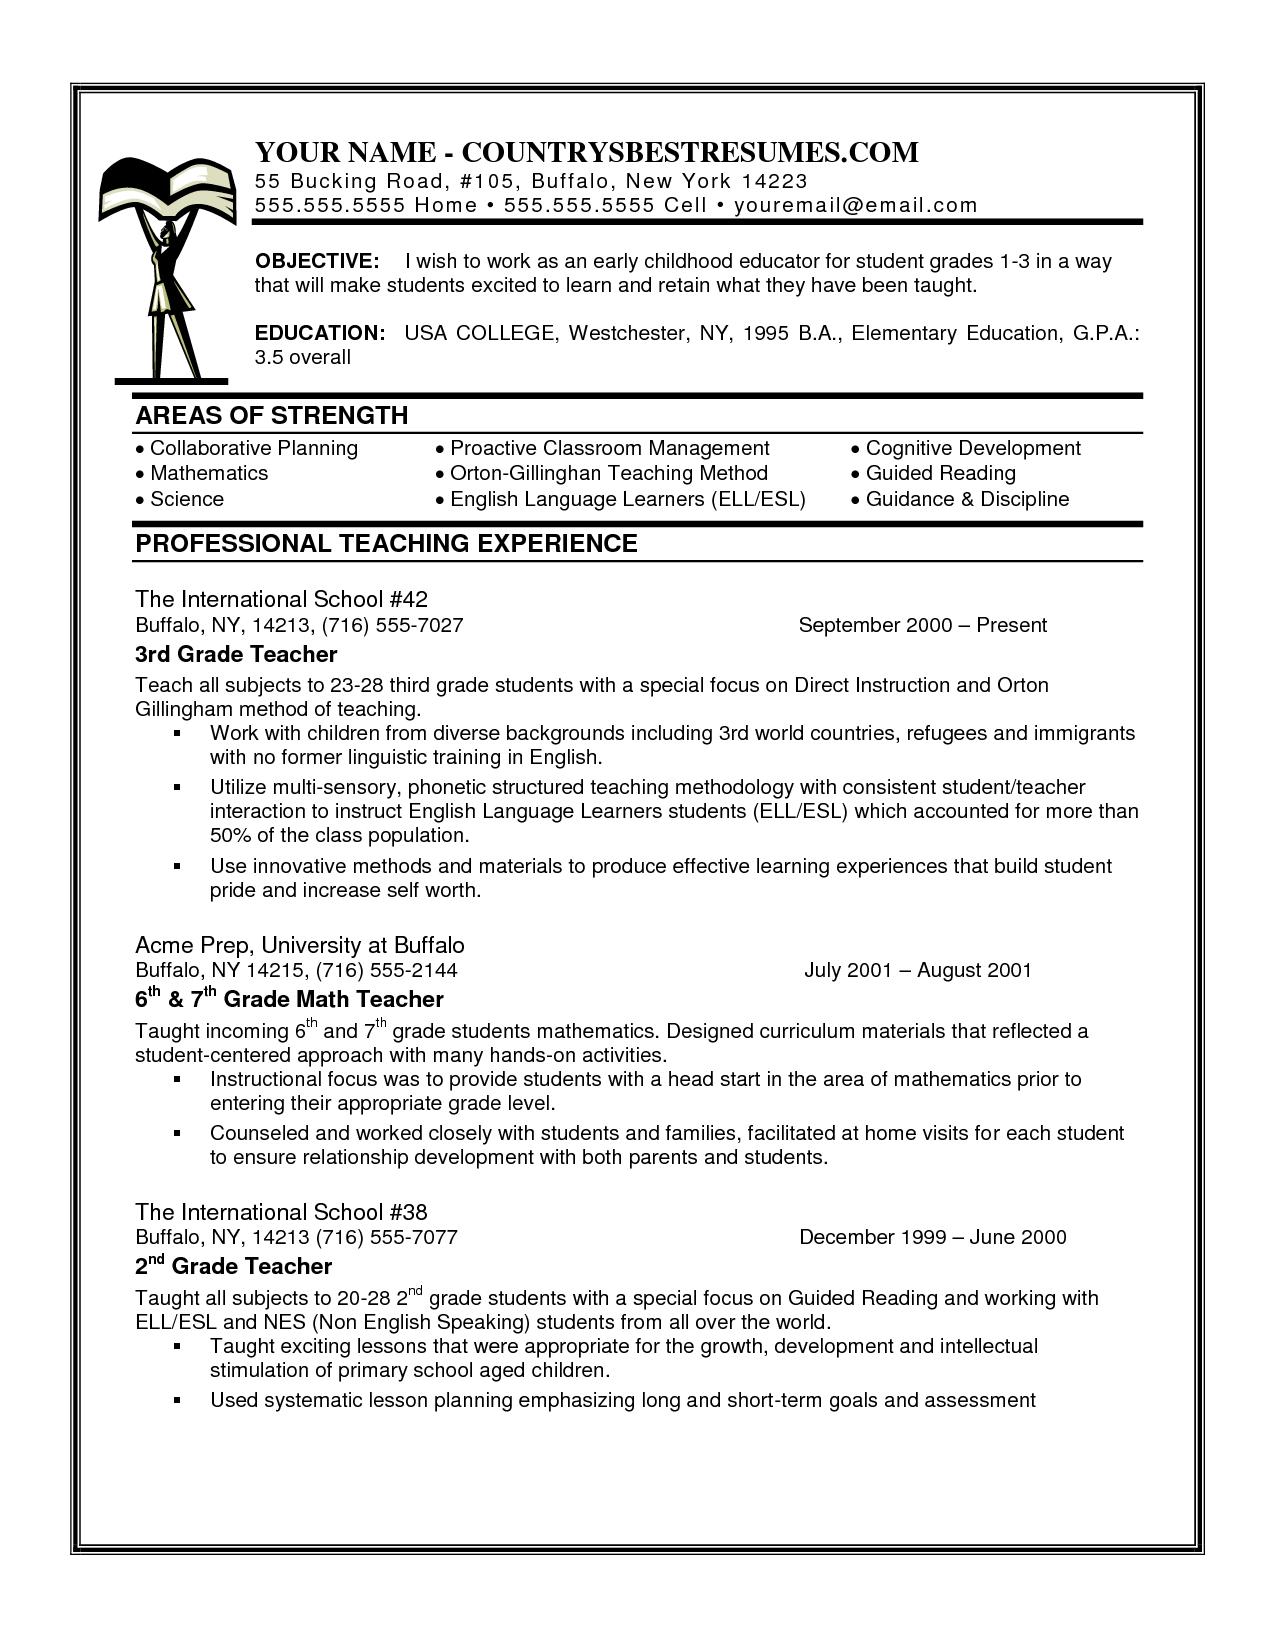 resumetipsnoexperience Teacher resume examples, Teacher